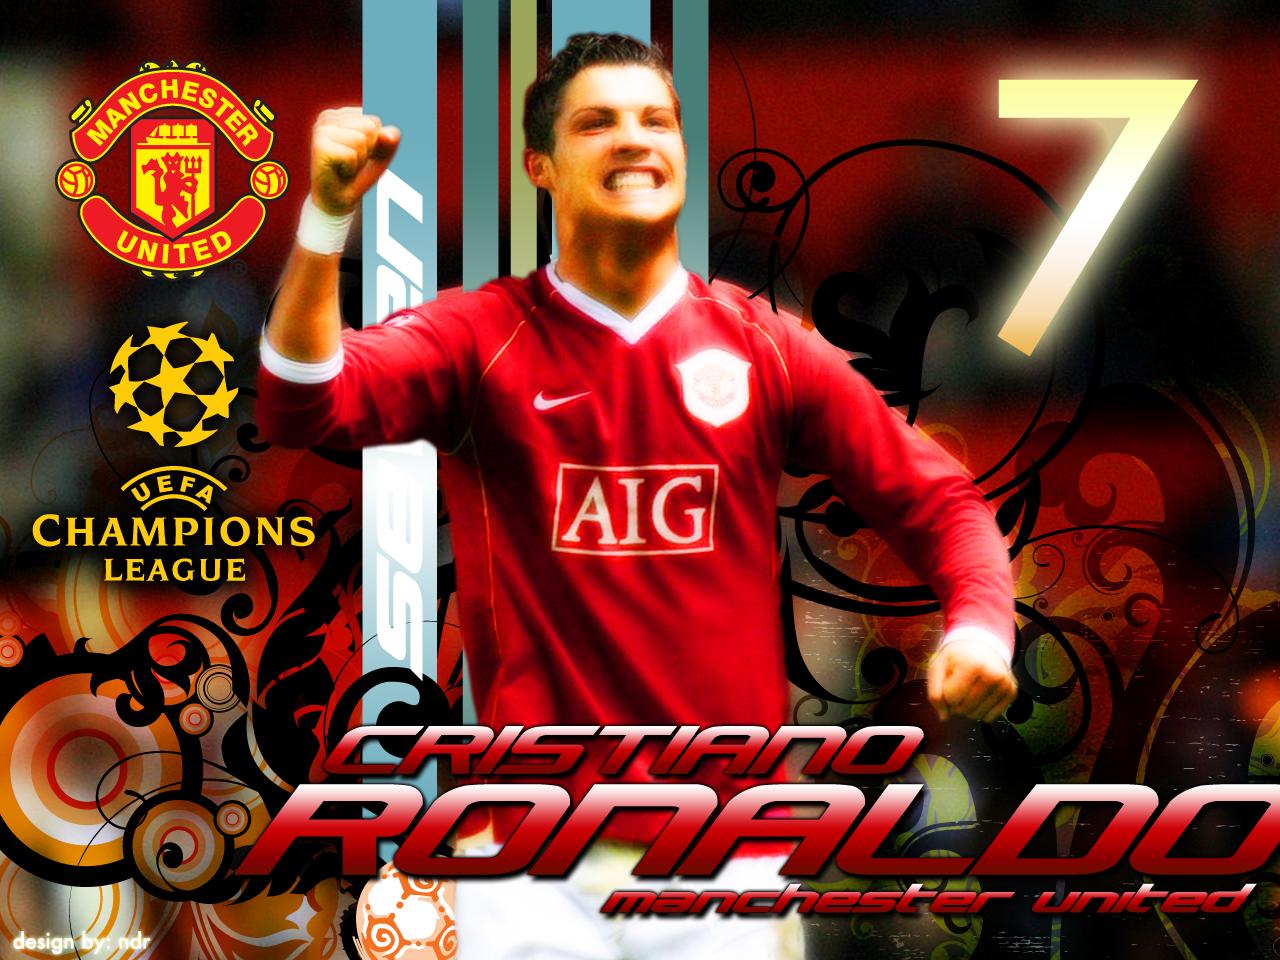 http://3.bp.blogspot.com/-8t-BEtNOlDI/TsUCZvmzooI/AAAAAAAAAbM/eRIUOqlCwIY/s1600/Ronaldo-pictures-9232.jpg